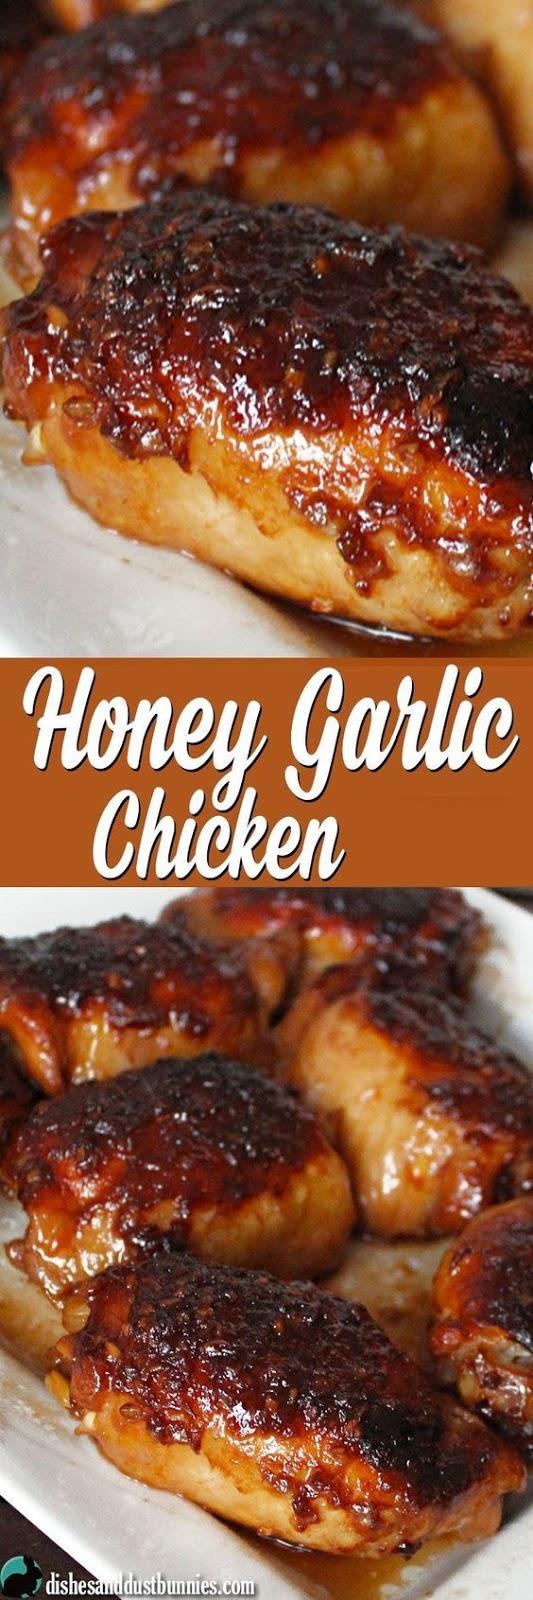 Honey Garlic Chicken (plus some really tasty sauce!) - Chicken Recipes